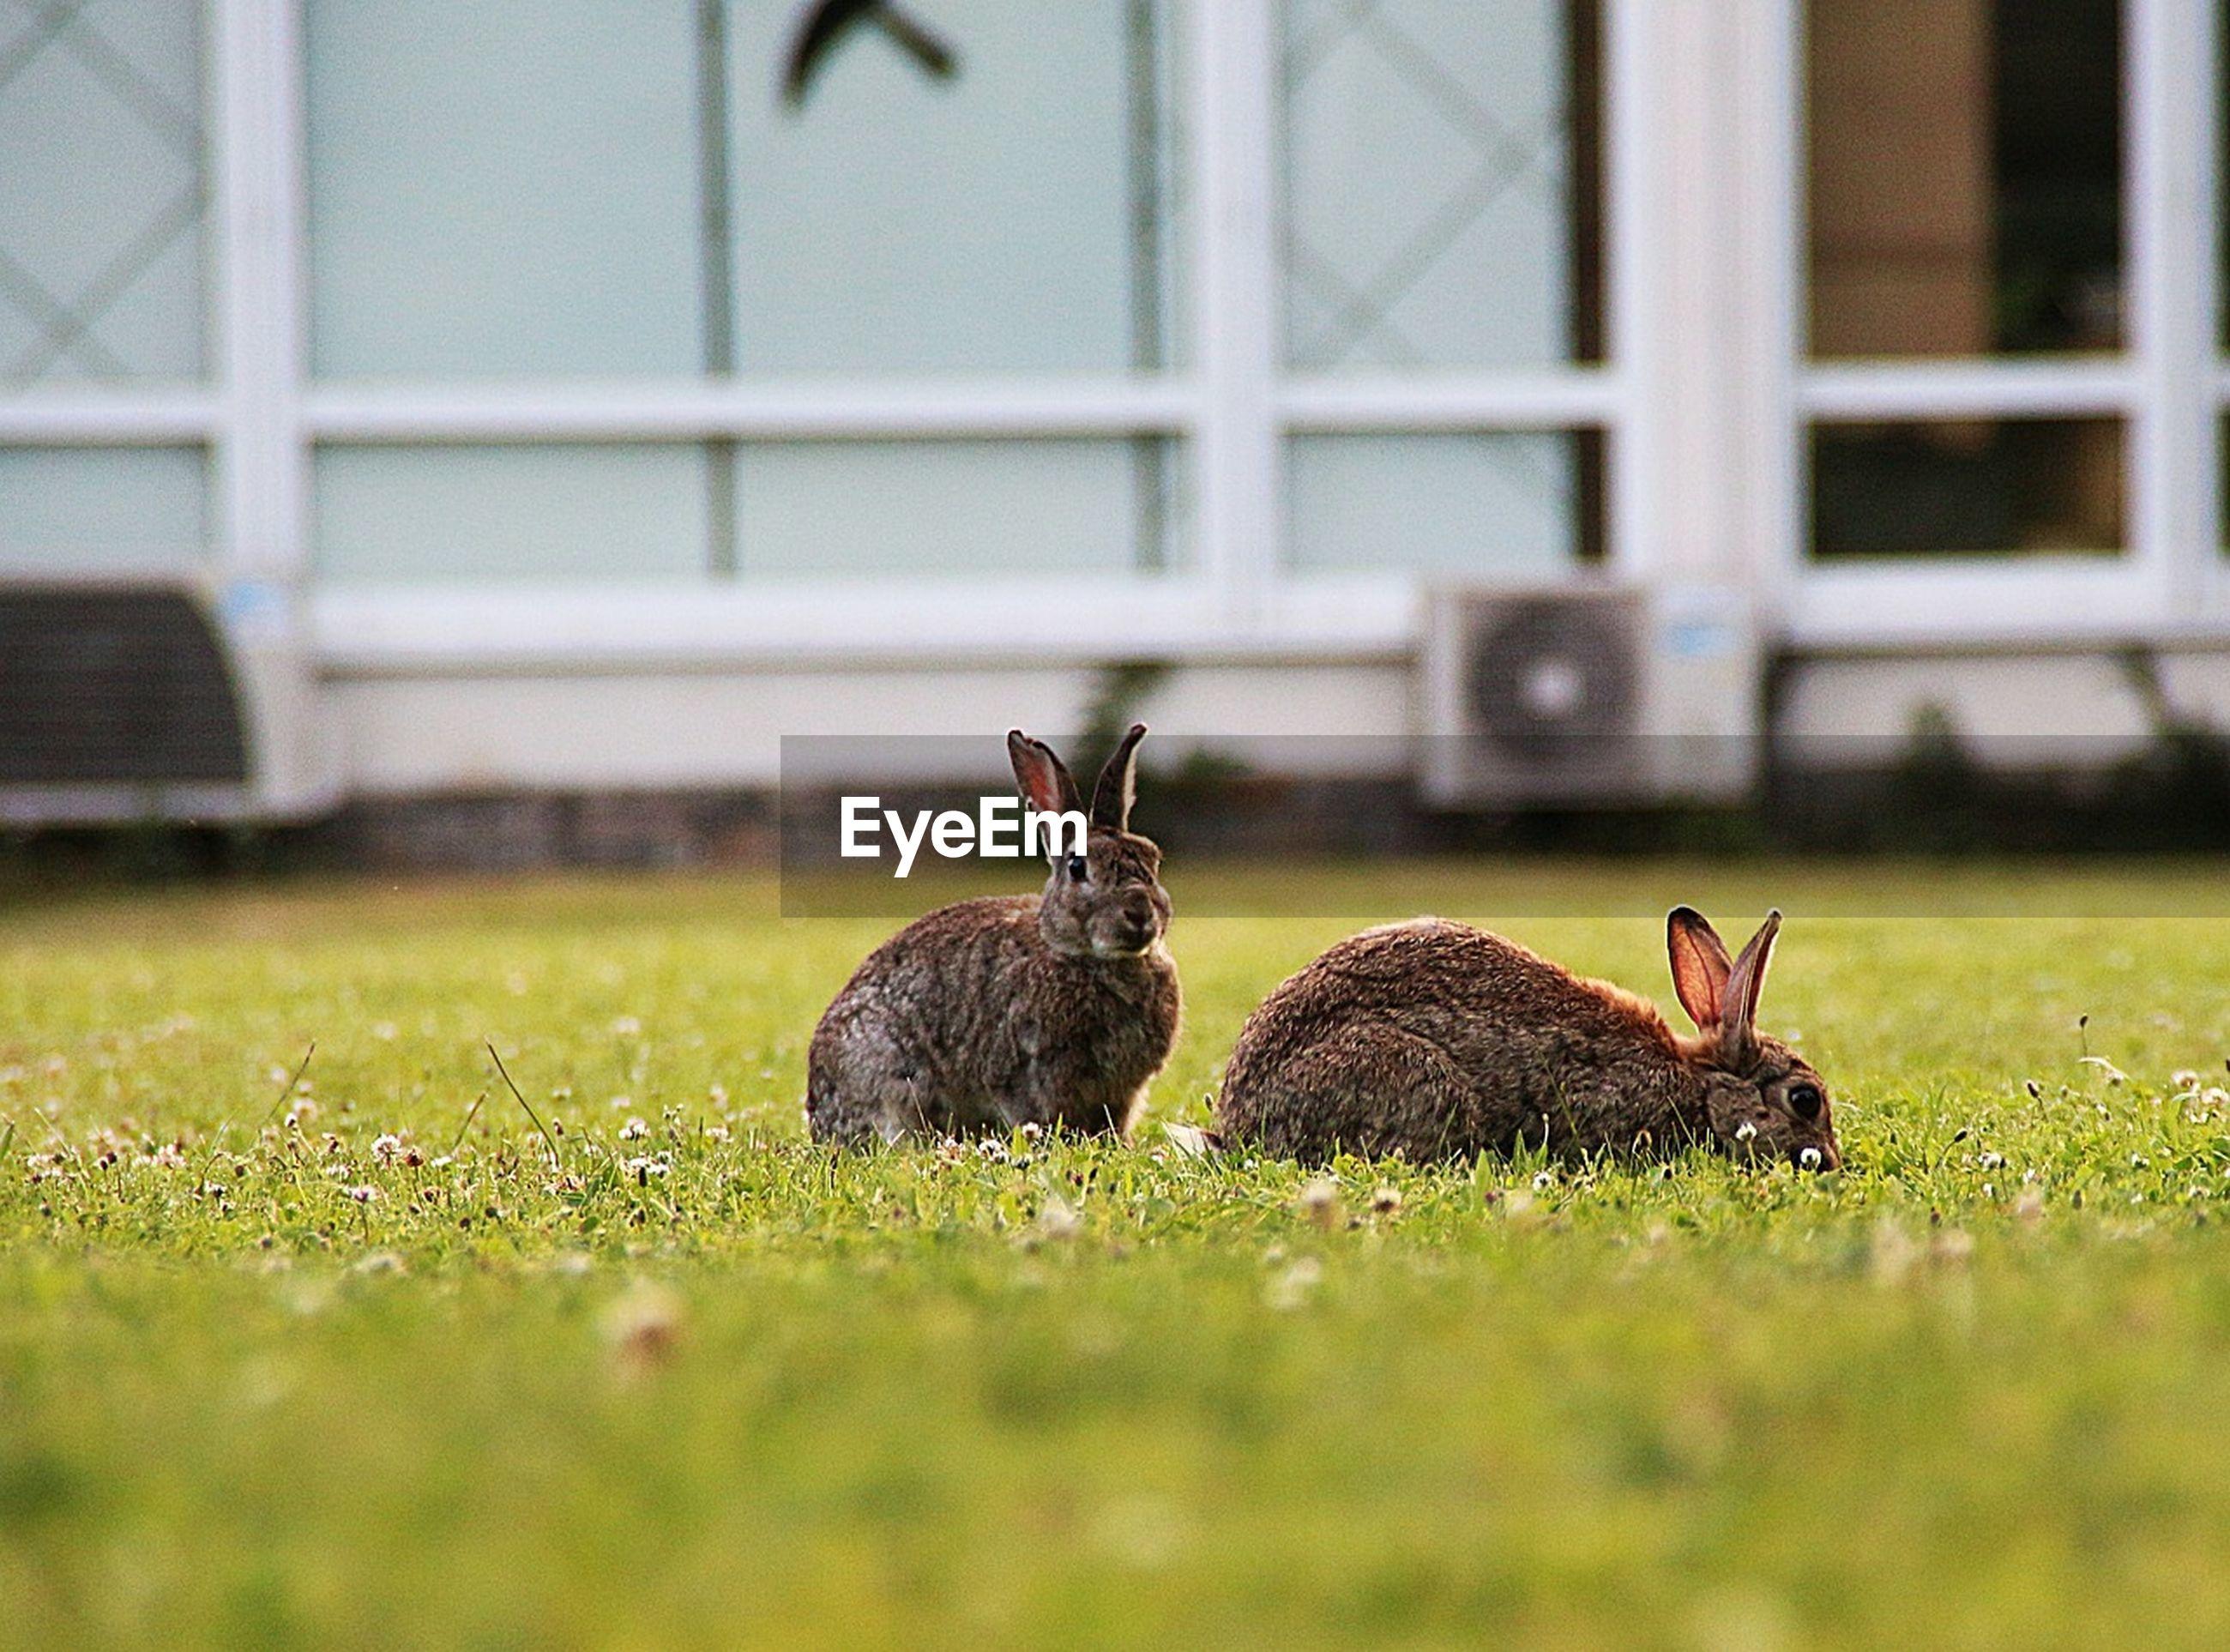 Rabbits grazing in field